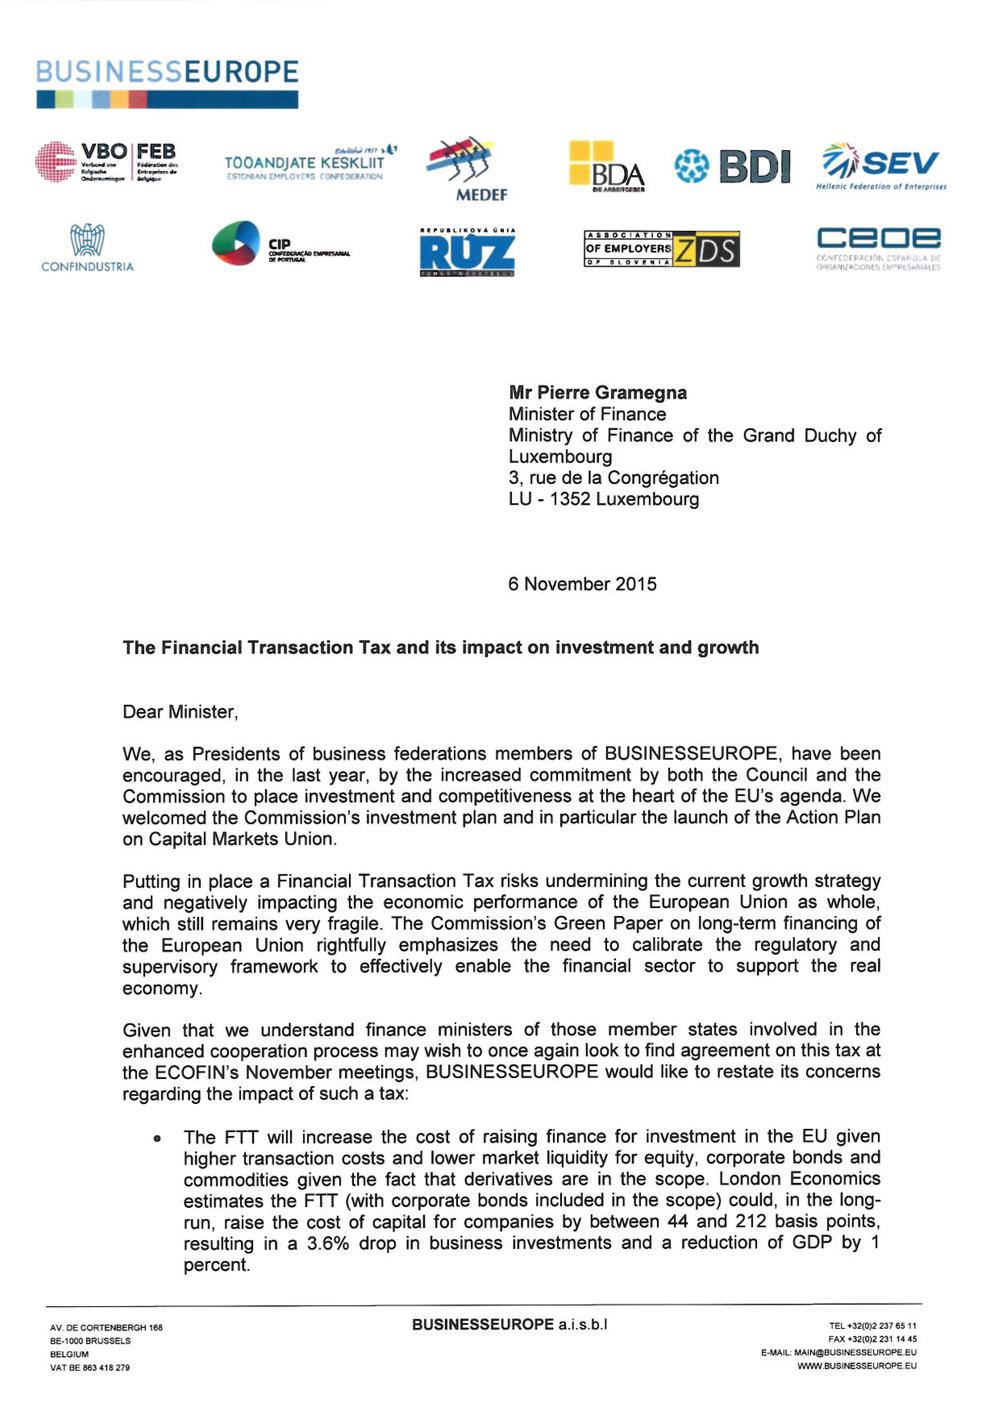 2015-11-06-Letter-on-FTT-to-ECOFIN-Council-November---Min--Gramegna---LU-1